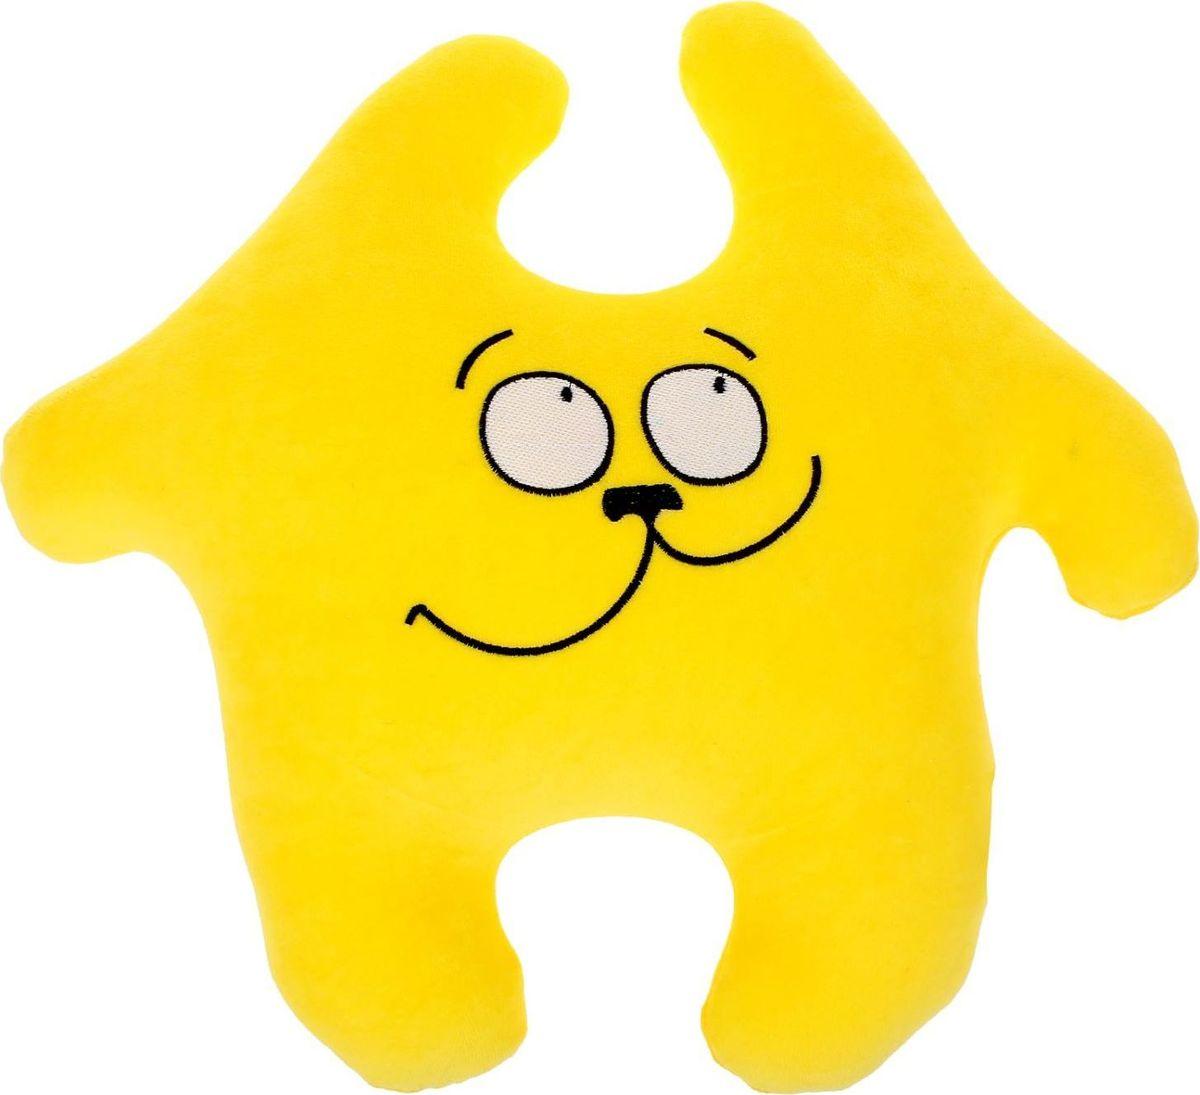 Sima-land Антистрессовая игрушка Заяц Хрустик 04 цвет желтый sima land антистрессовая игрушка заяц хрустик 04 цвет желтый